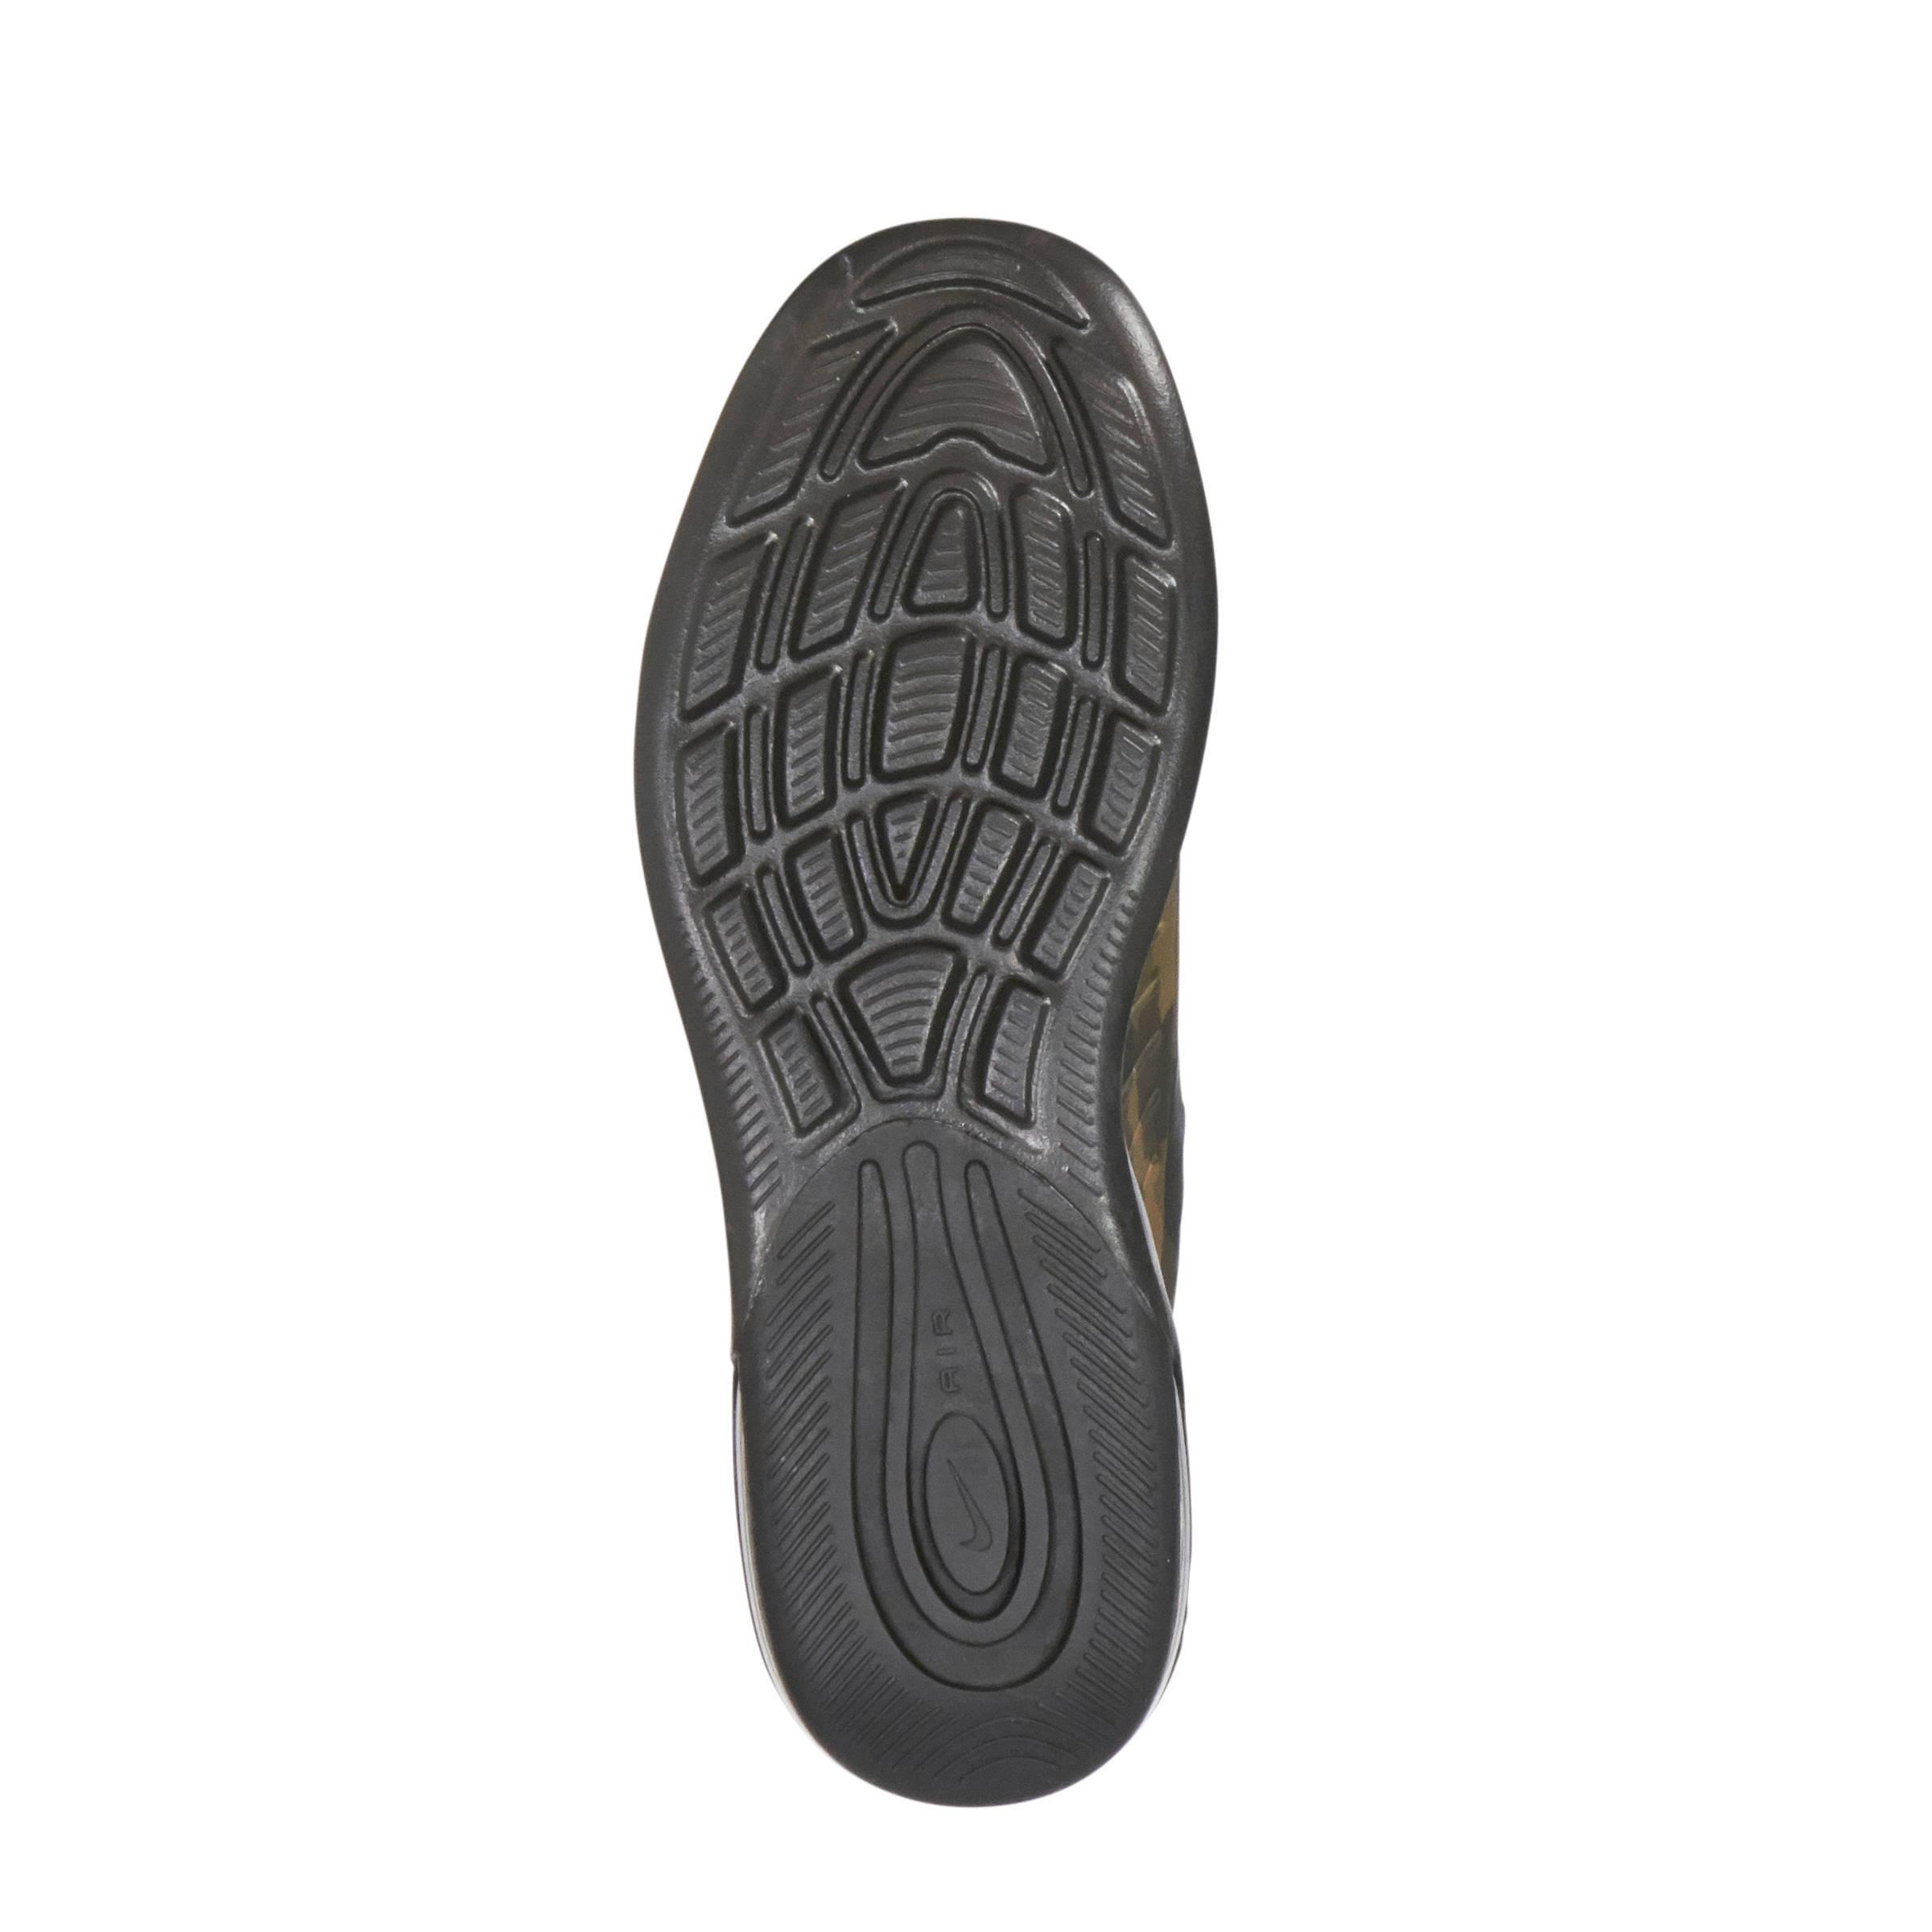 Nike Air Max Axis Premium camouflage sneakers | wehkamp